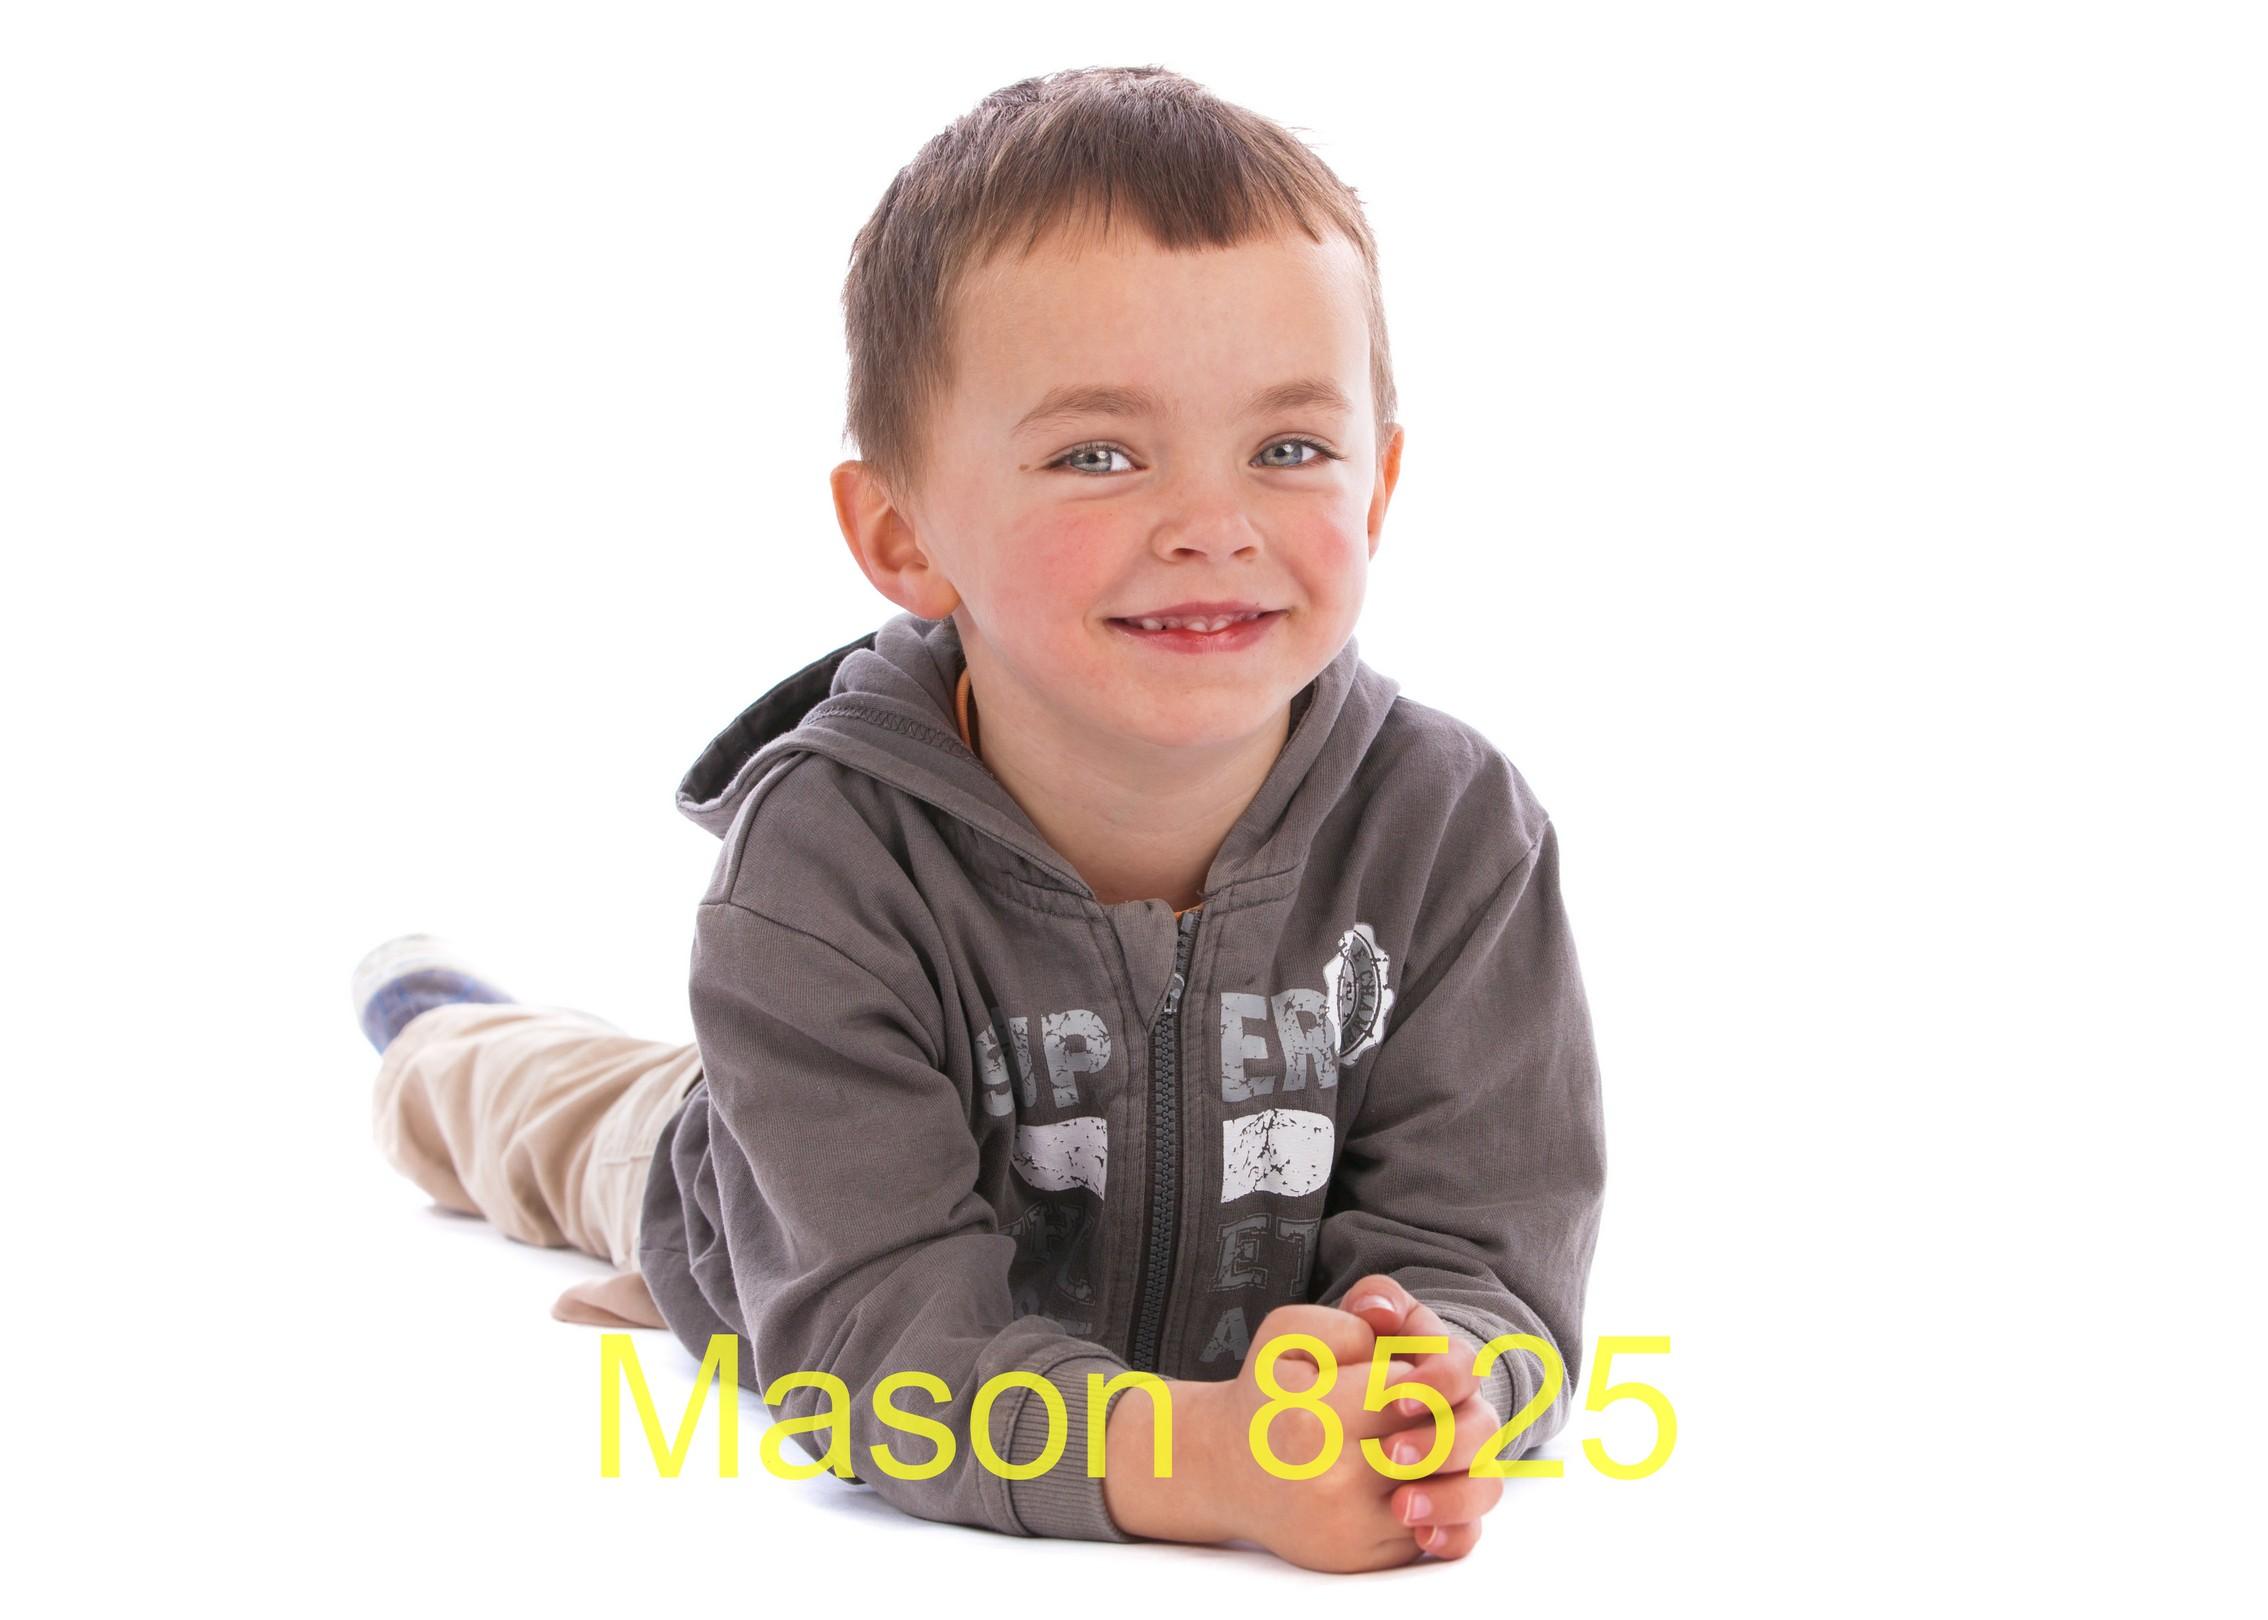 Mason 8525